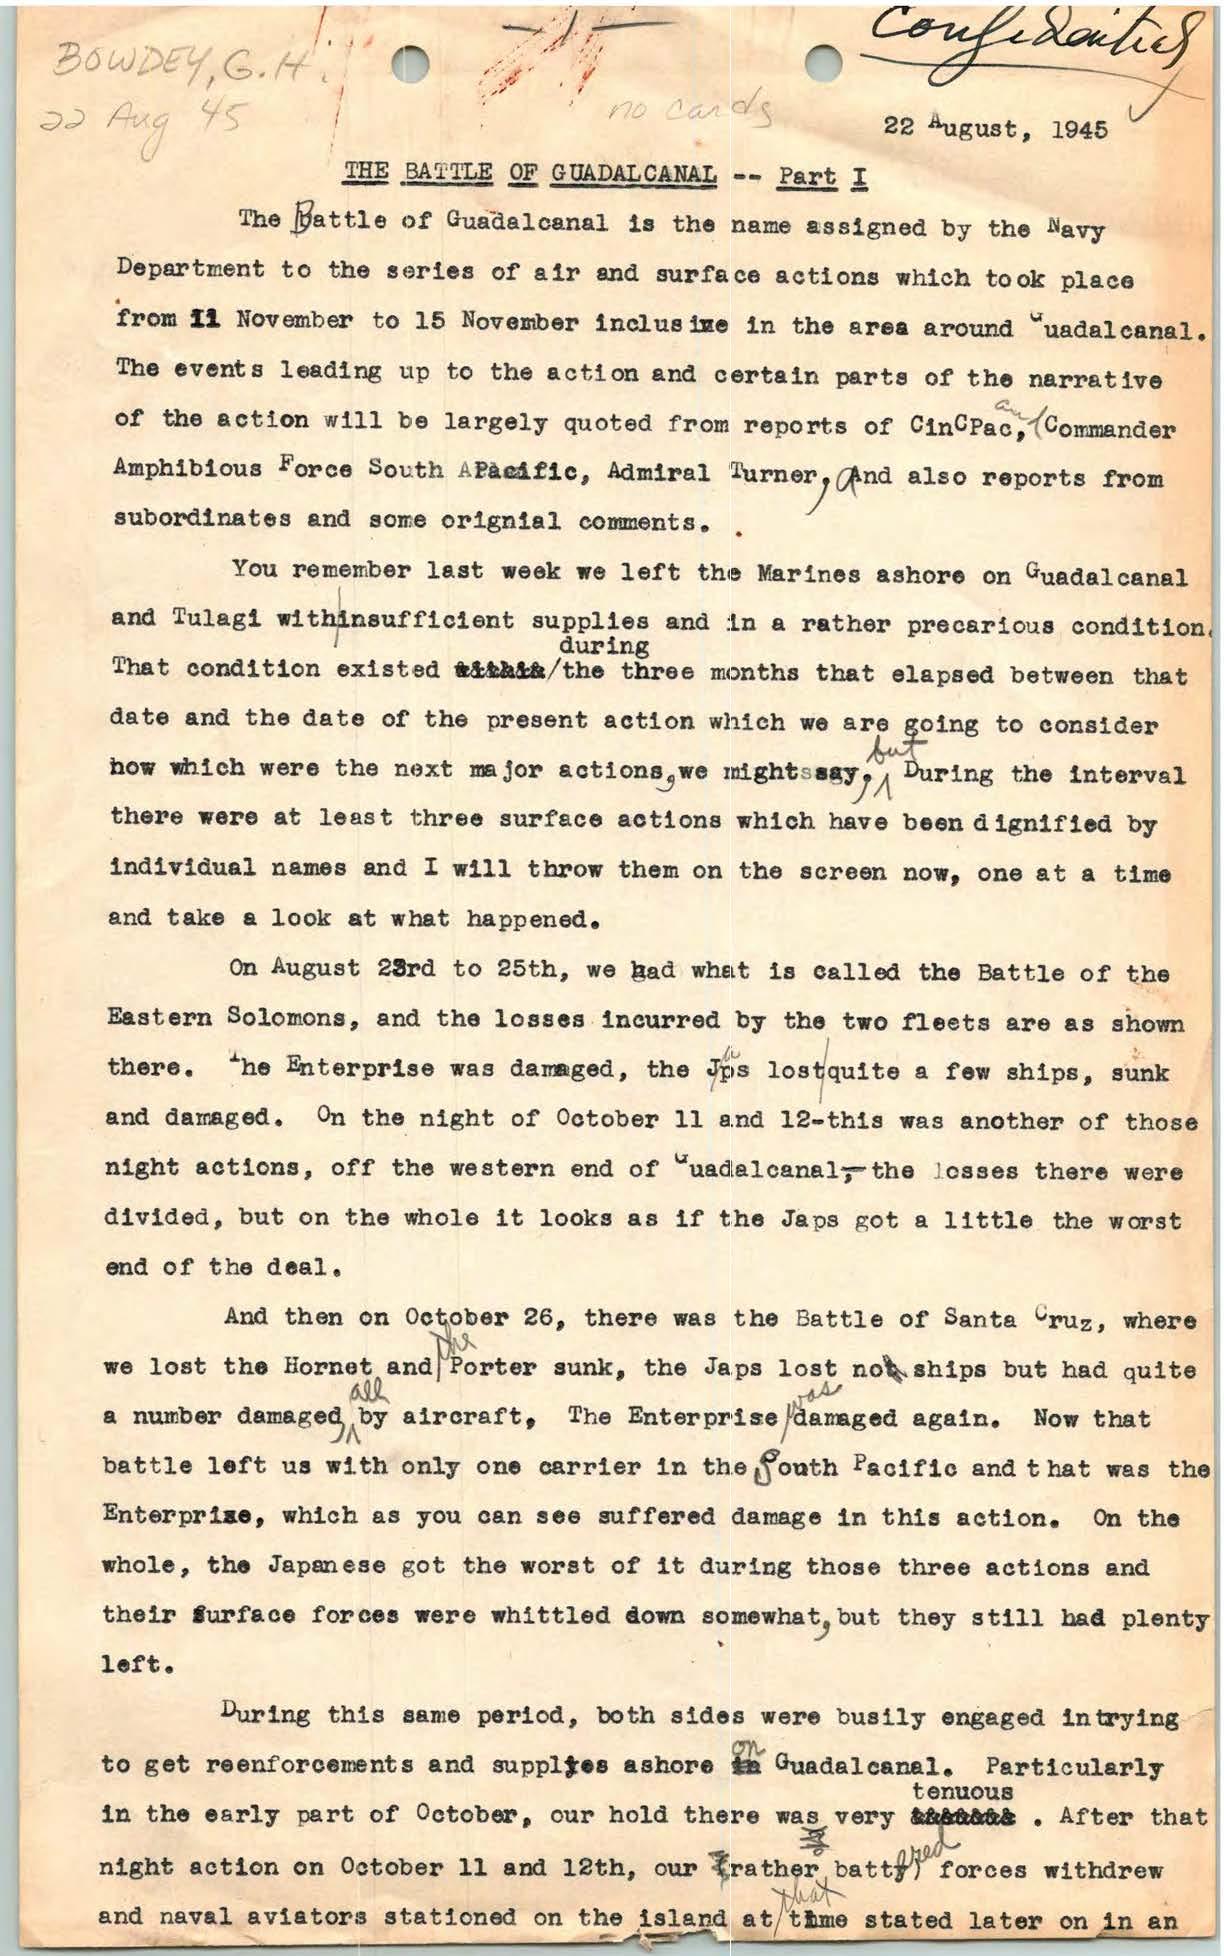 Battle of Guadalcanal, G.H. Bowdey